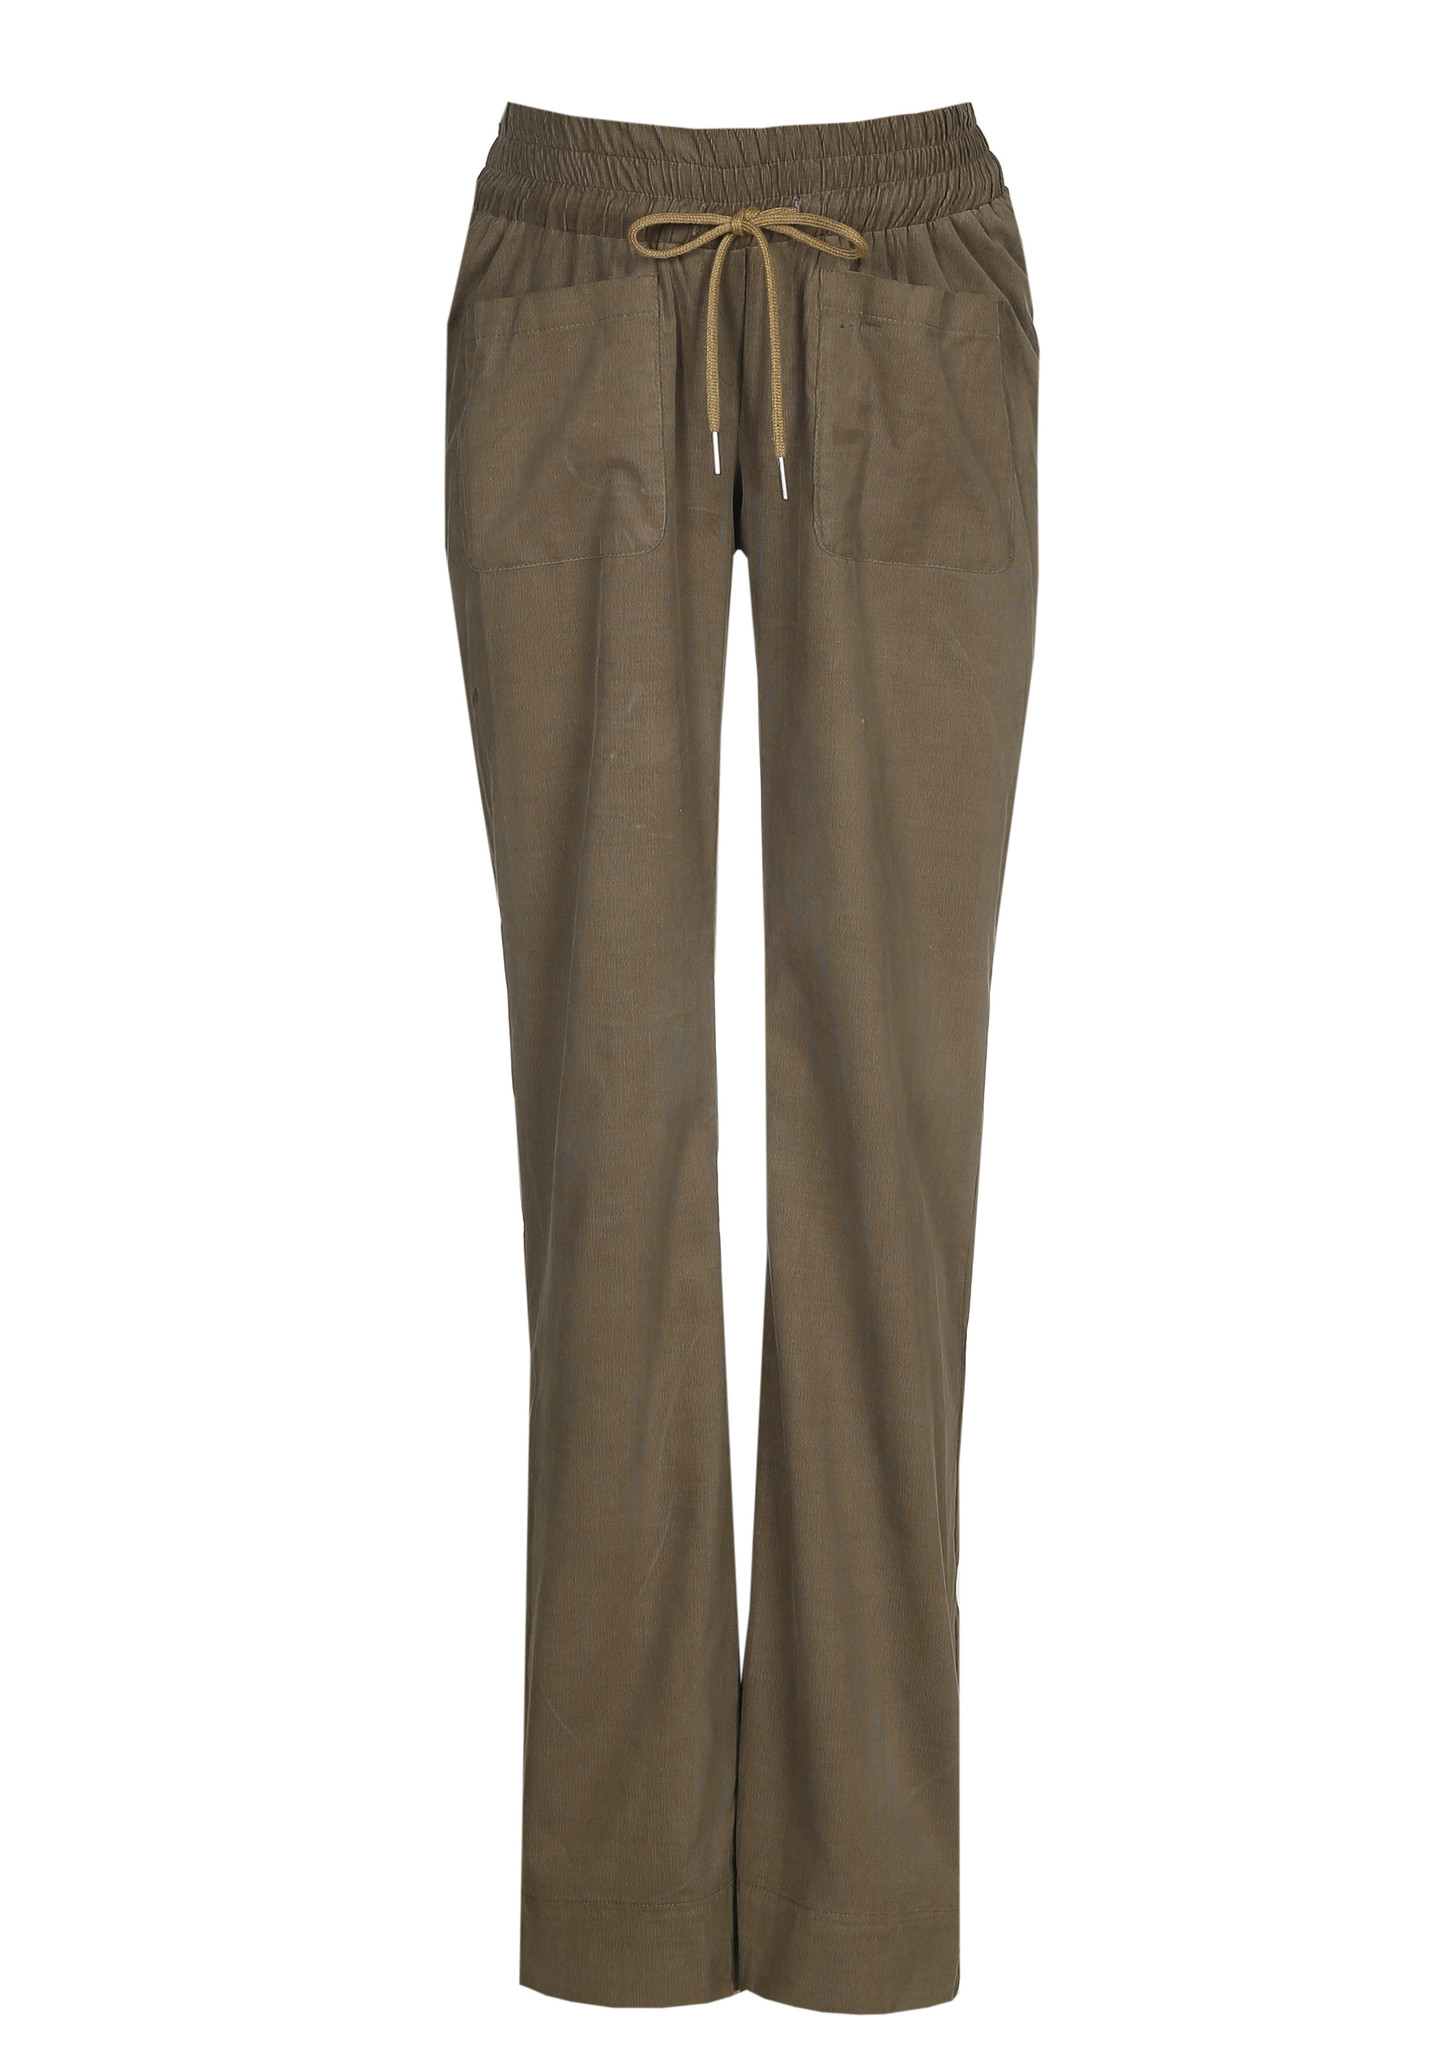 easy pocket trouserss - kaki babycord-1